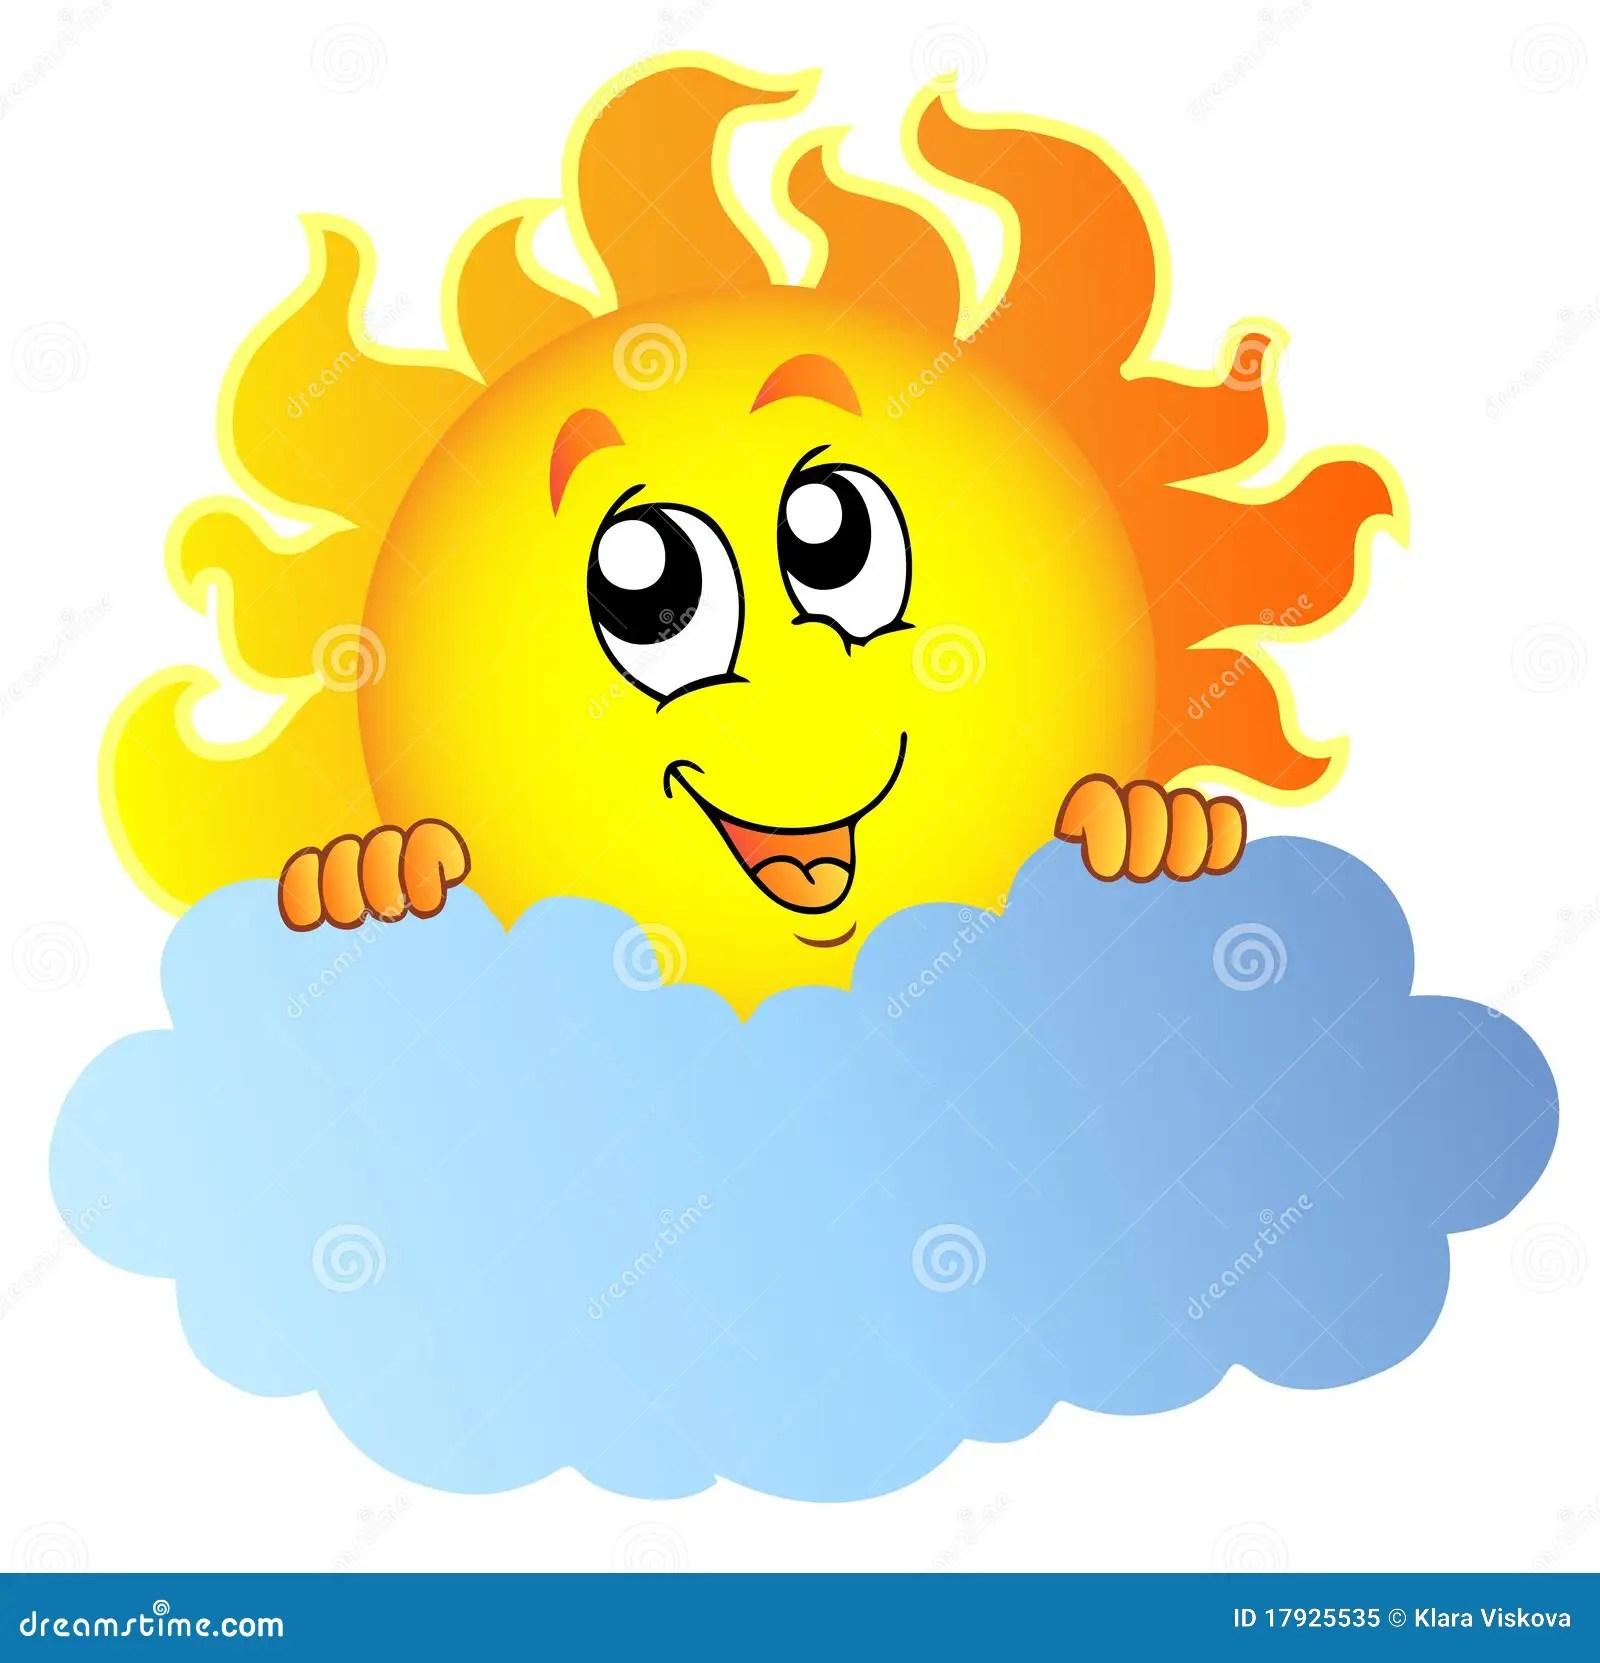 hight resolution of cartoon sun holding cloud